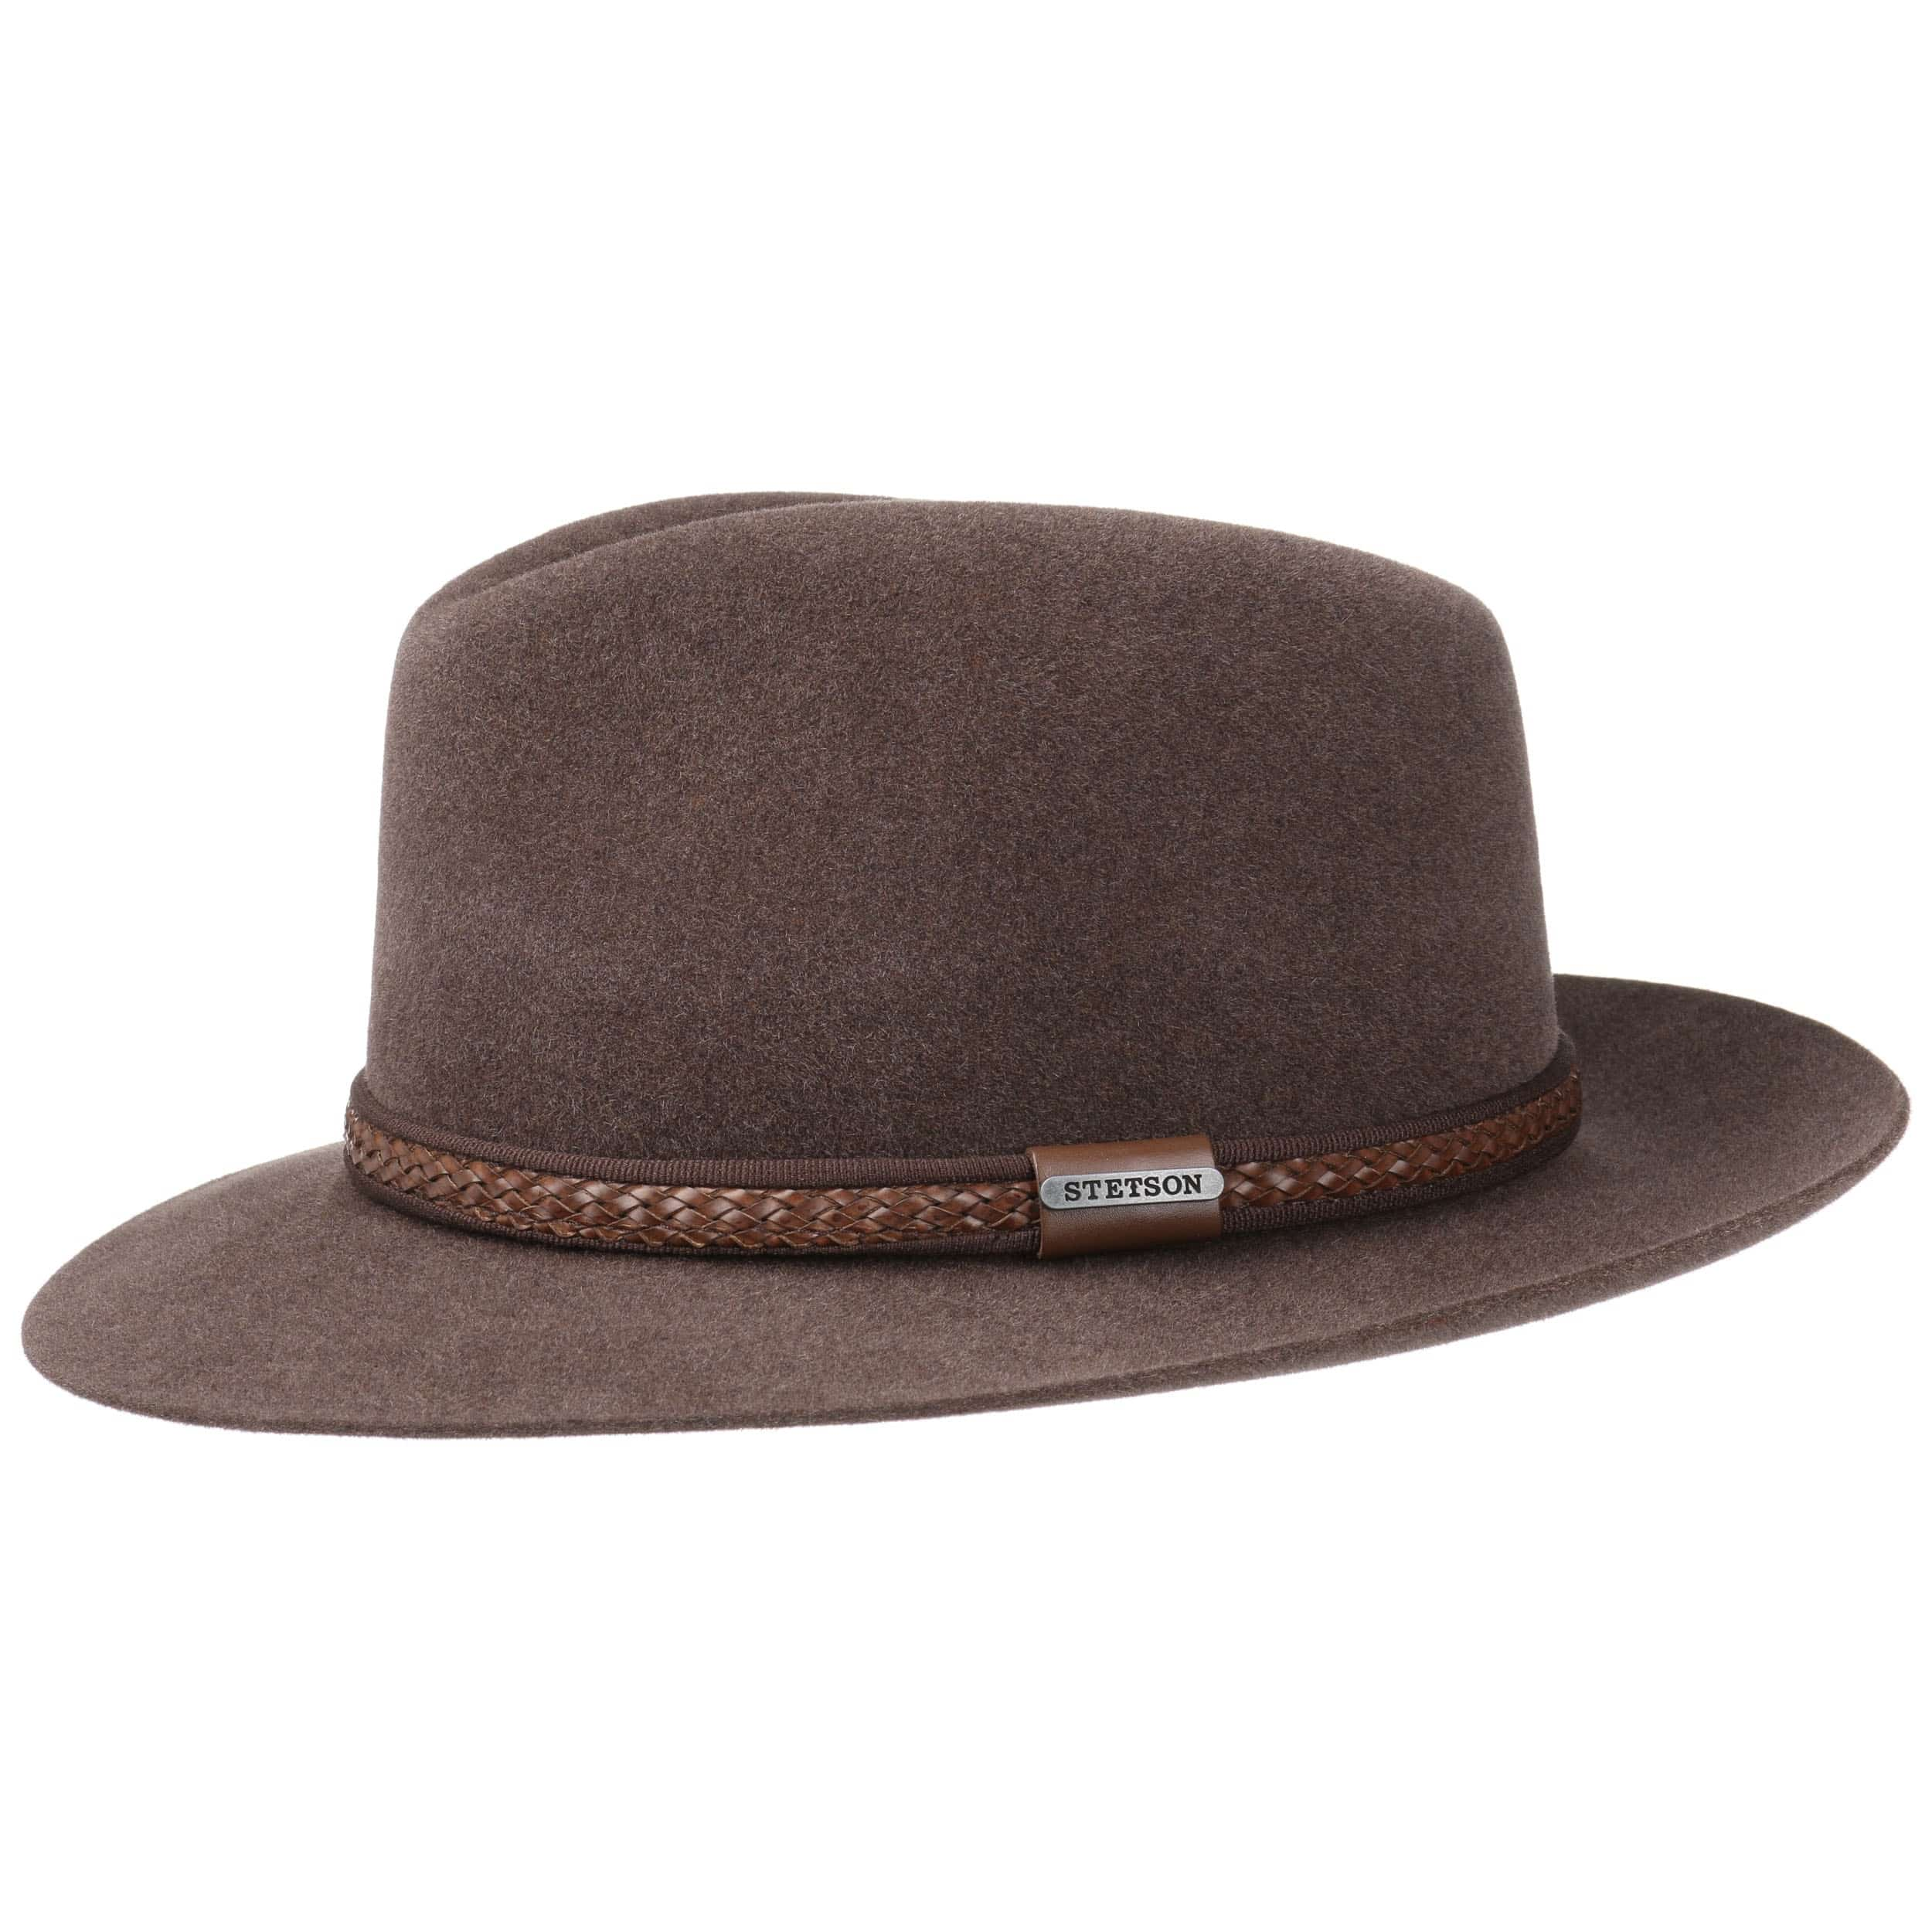 79f895823b9 Fur Felt Hats. brown 4x beaver fur felt hat 4 brim rodeo king cowboy ...